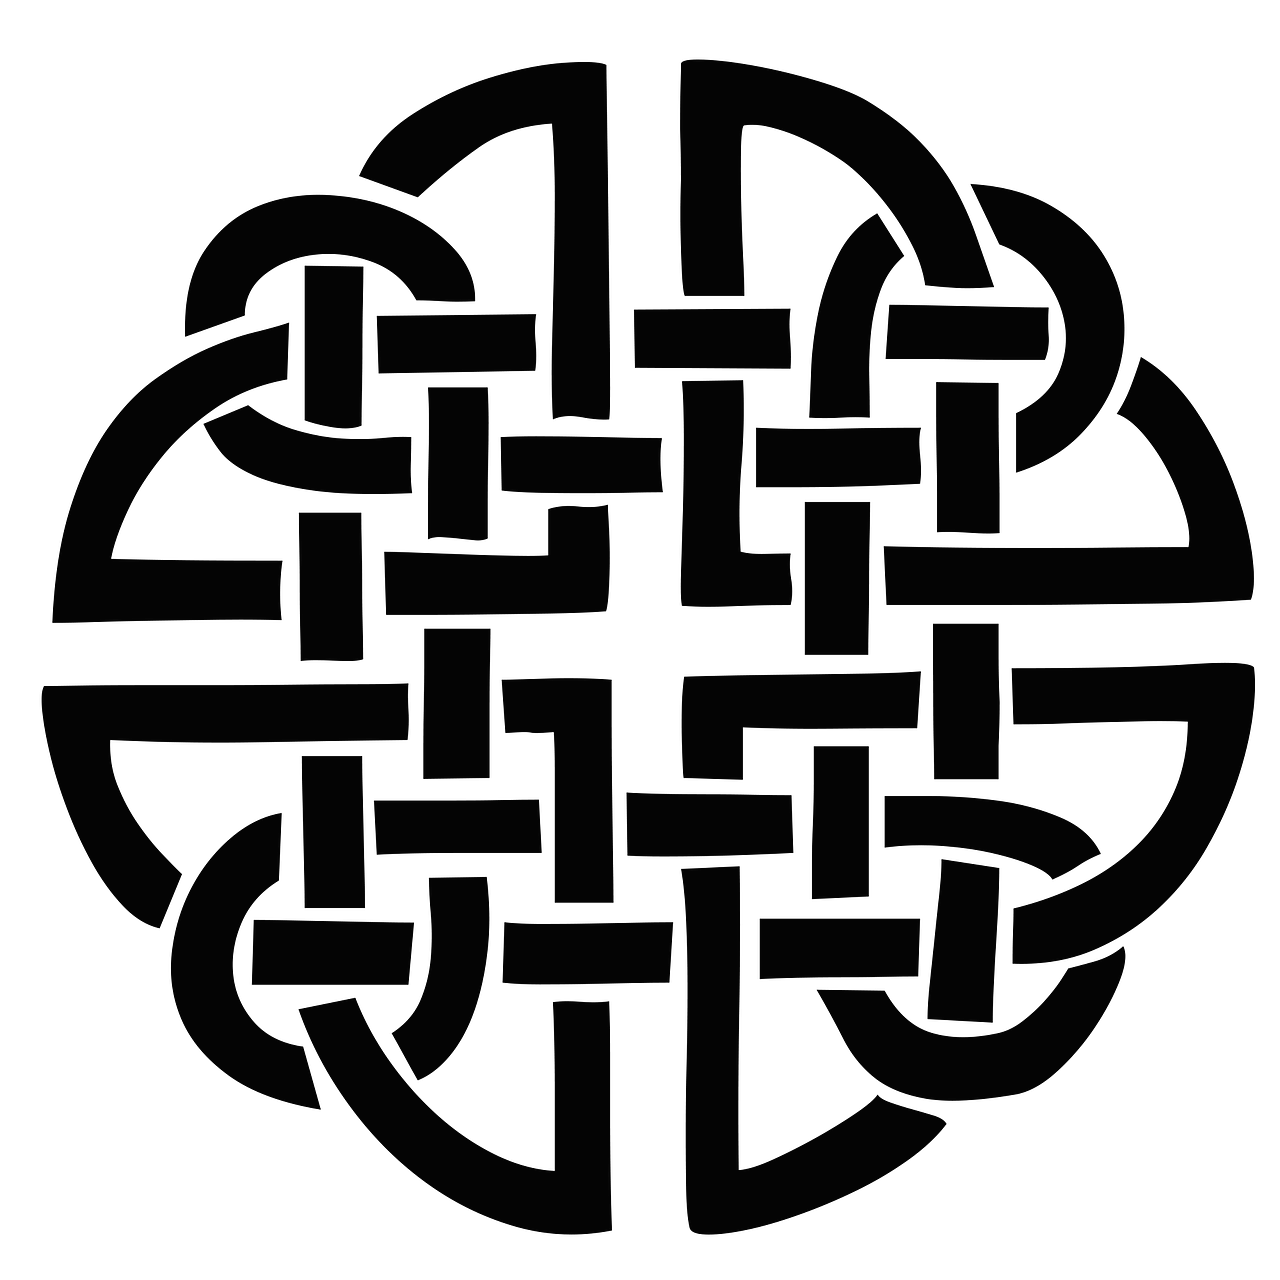 Free Image On Pixabay Celtic Knot Silhouette Shape Celtic Symbols Celtic Symbols And Meanings Celtic Knot Meanings